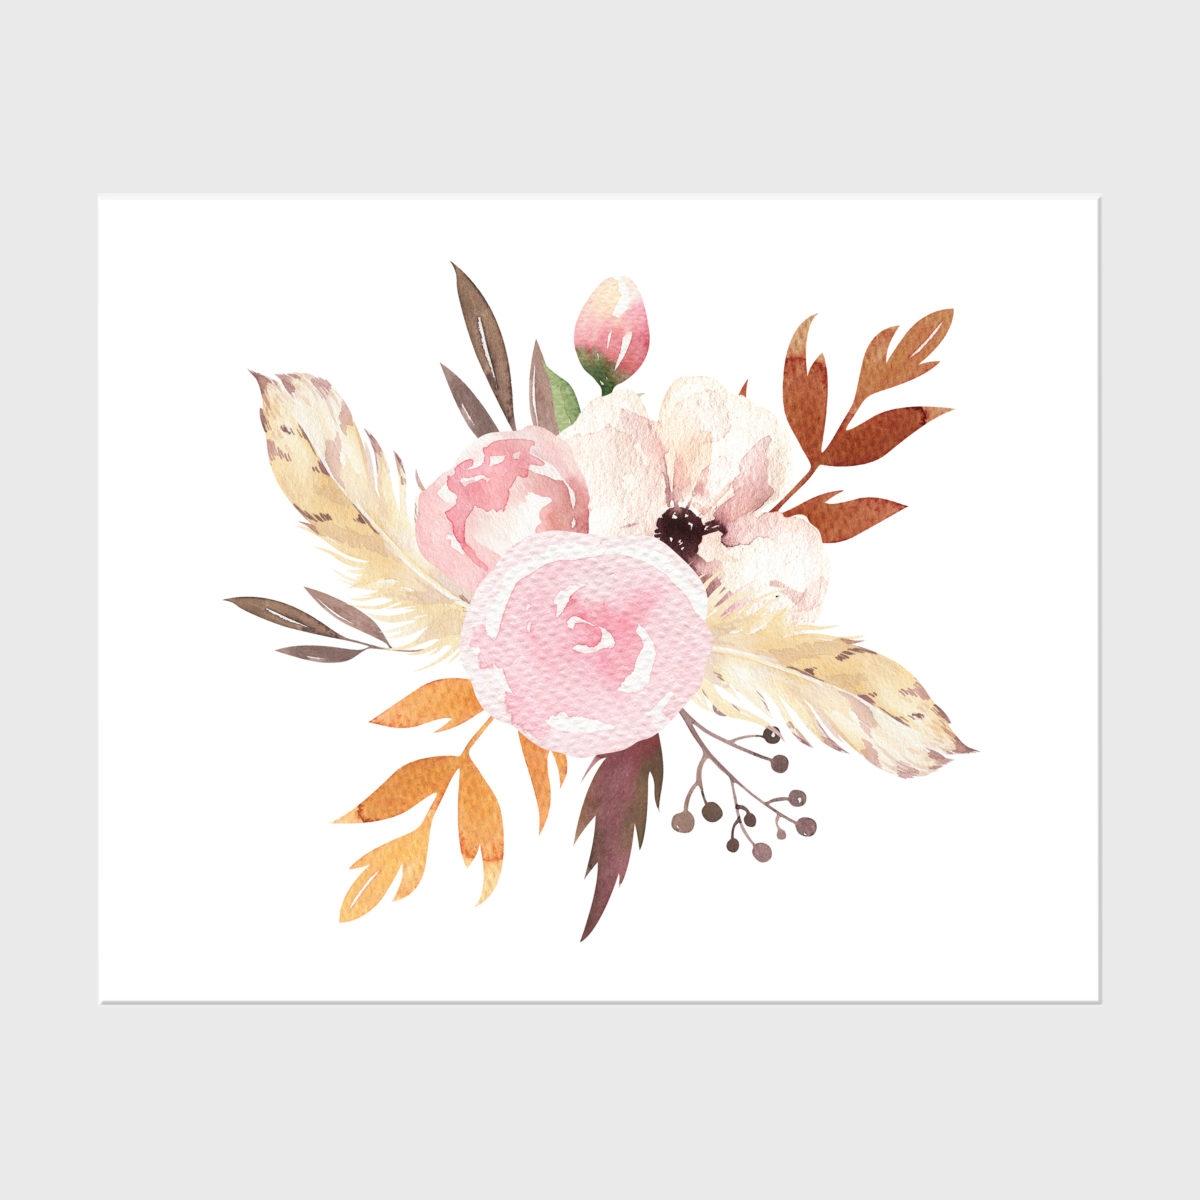 37. Floral (7)